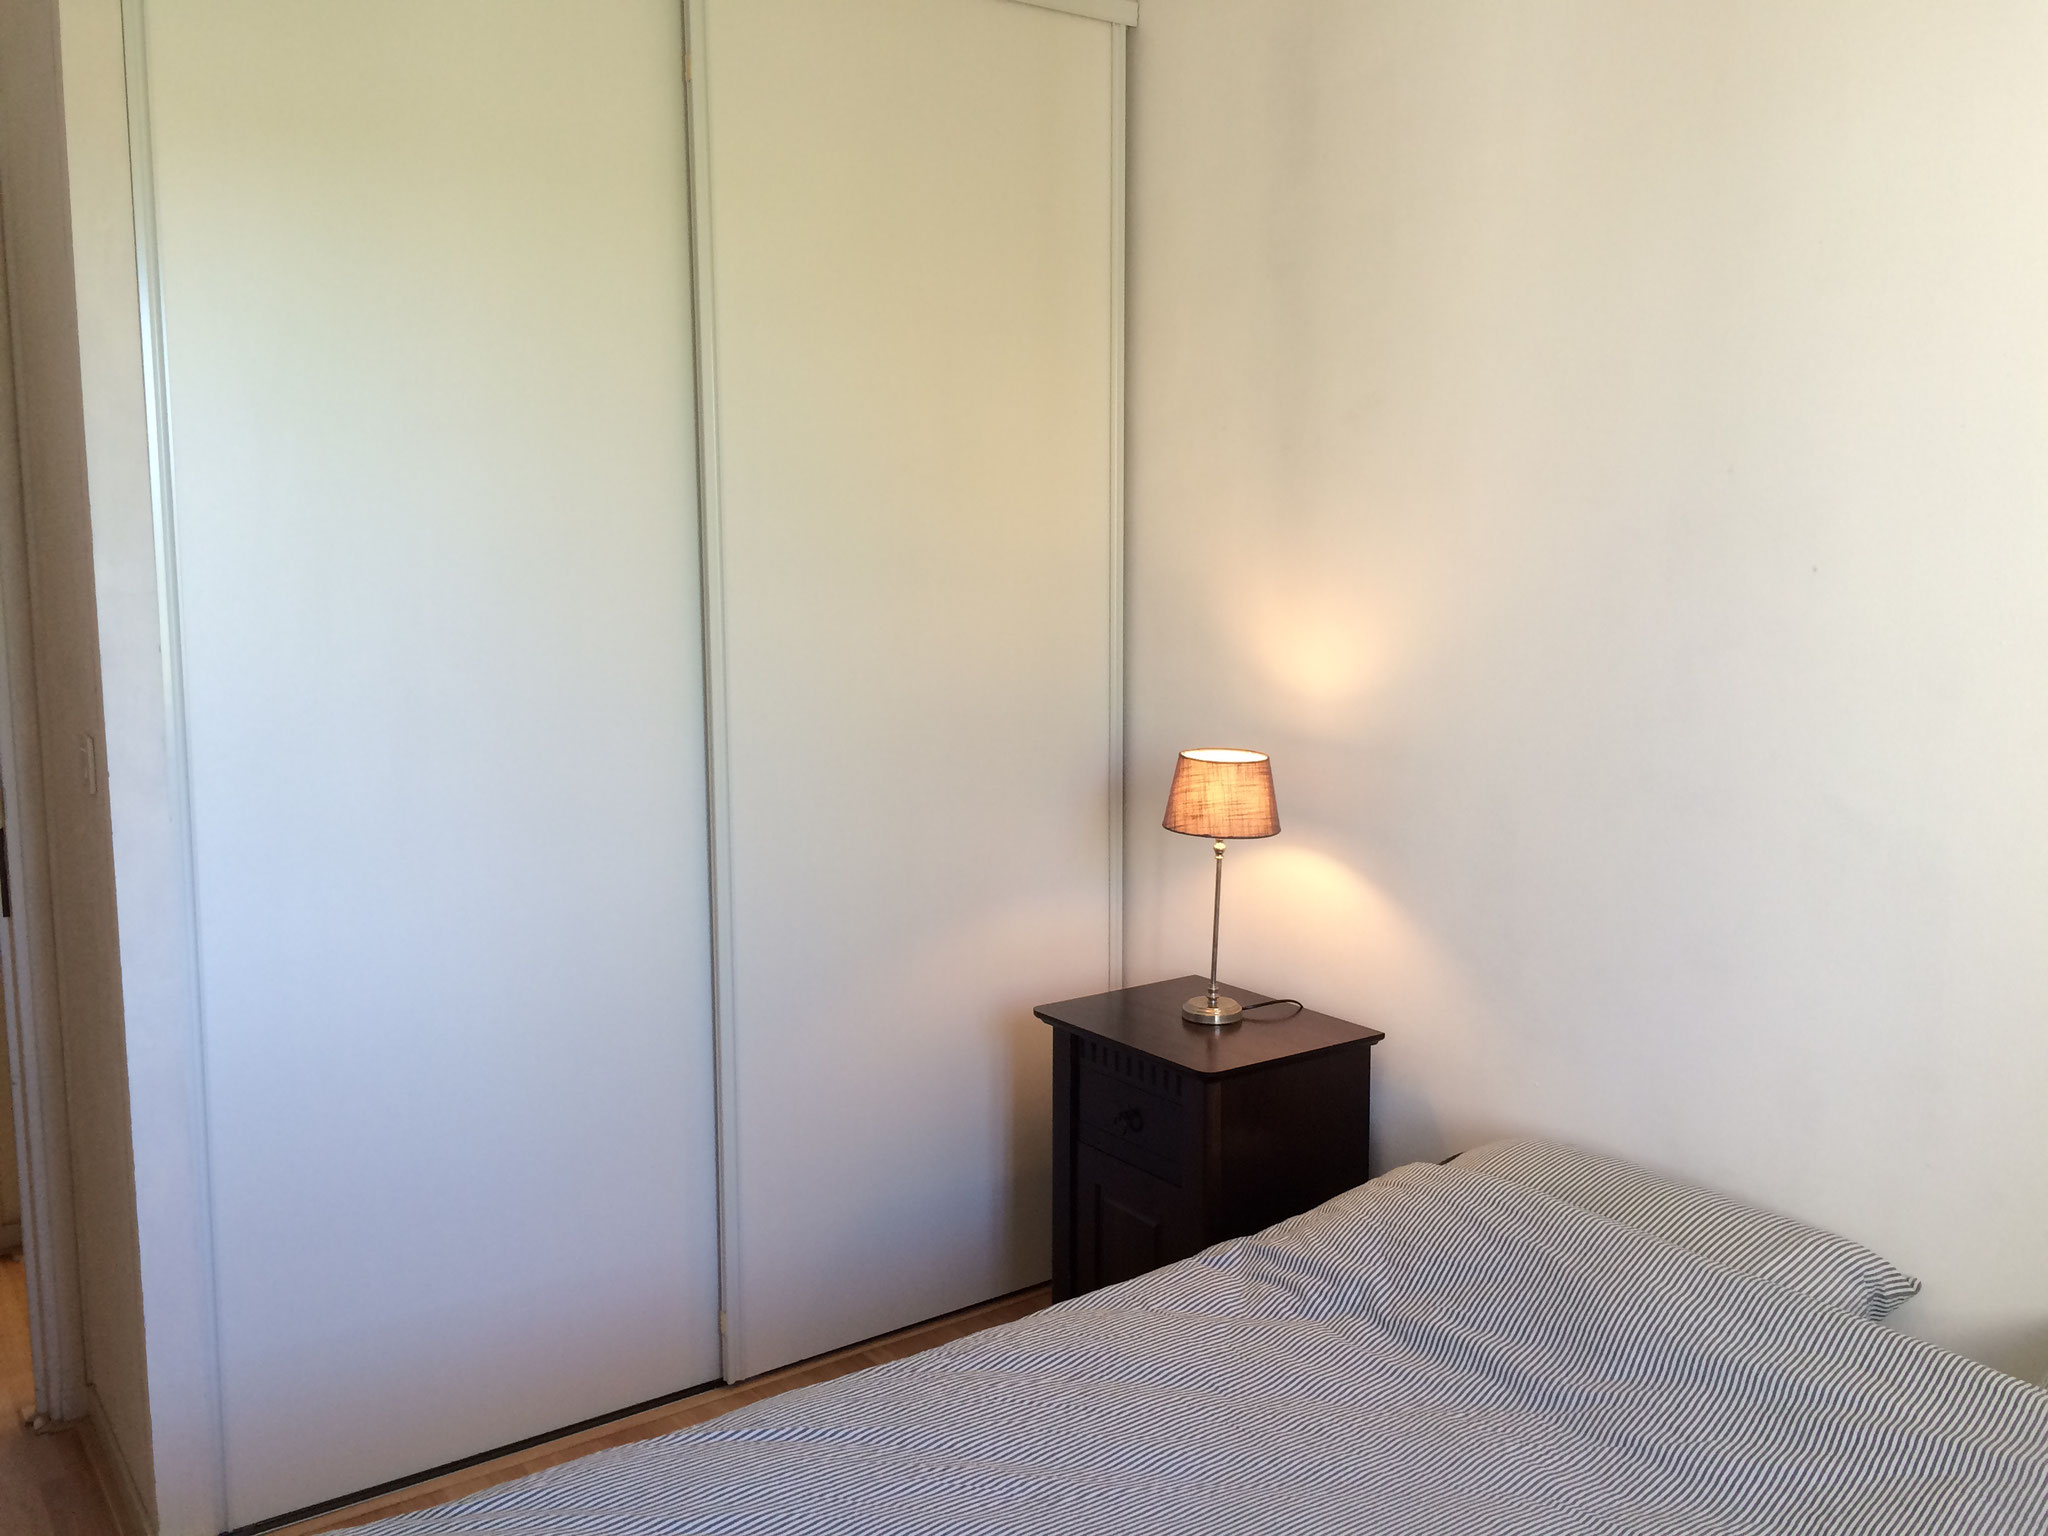 Slaapkamer 1 met vaste kasten